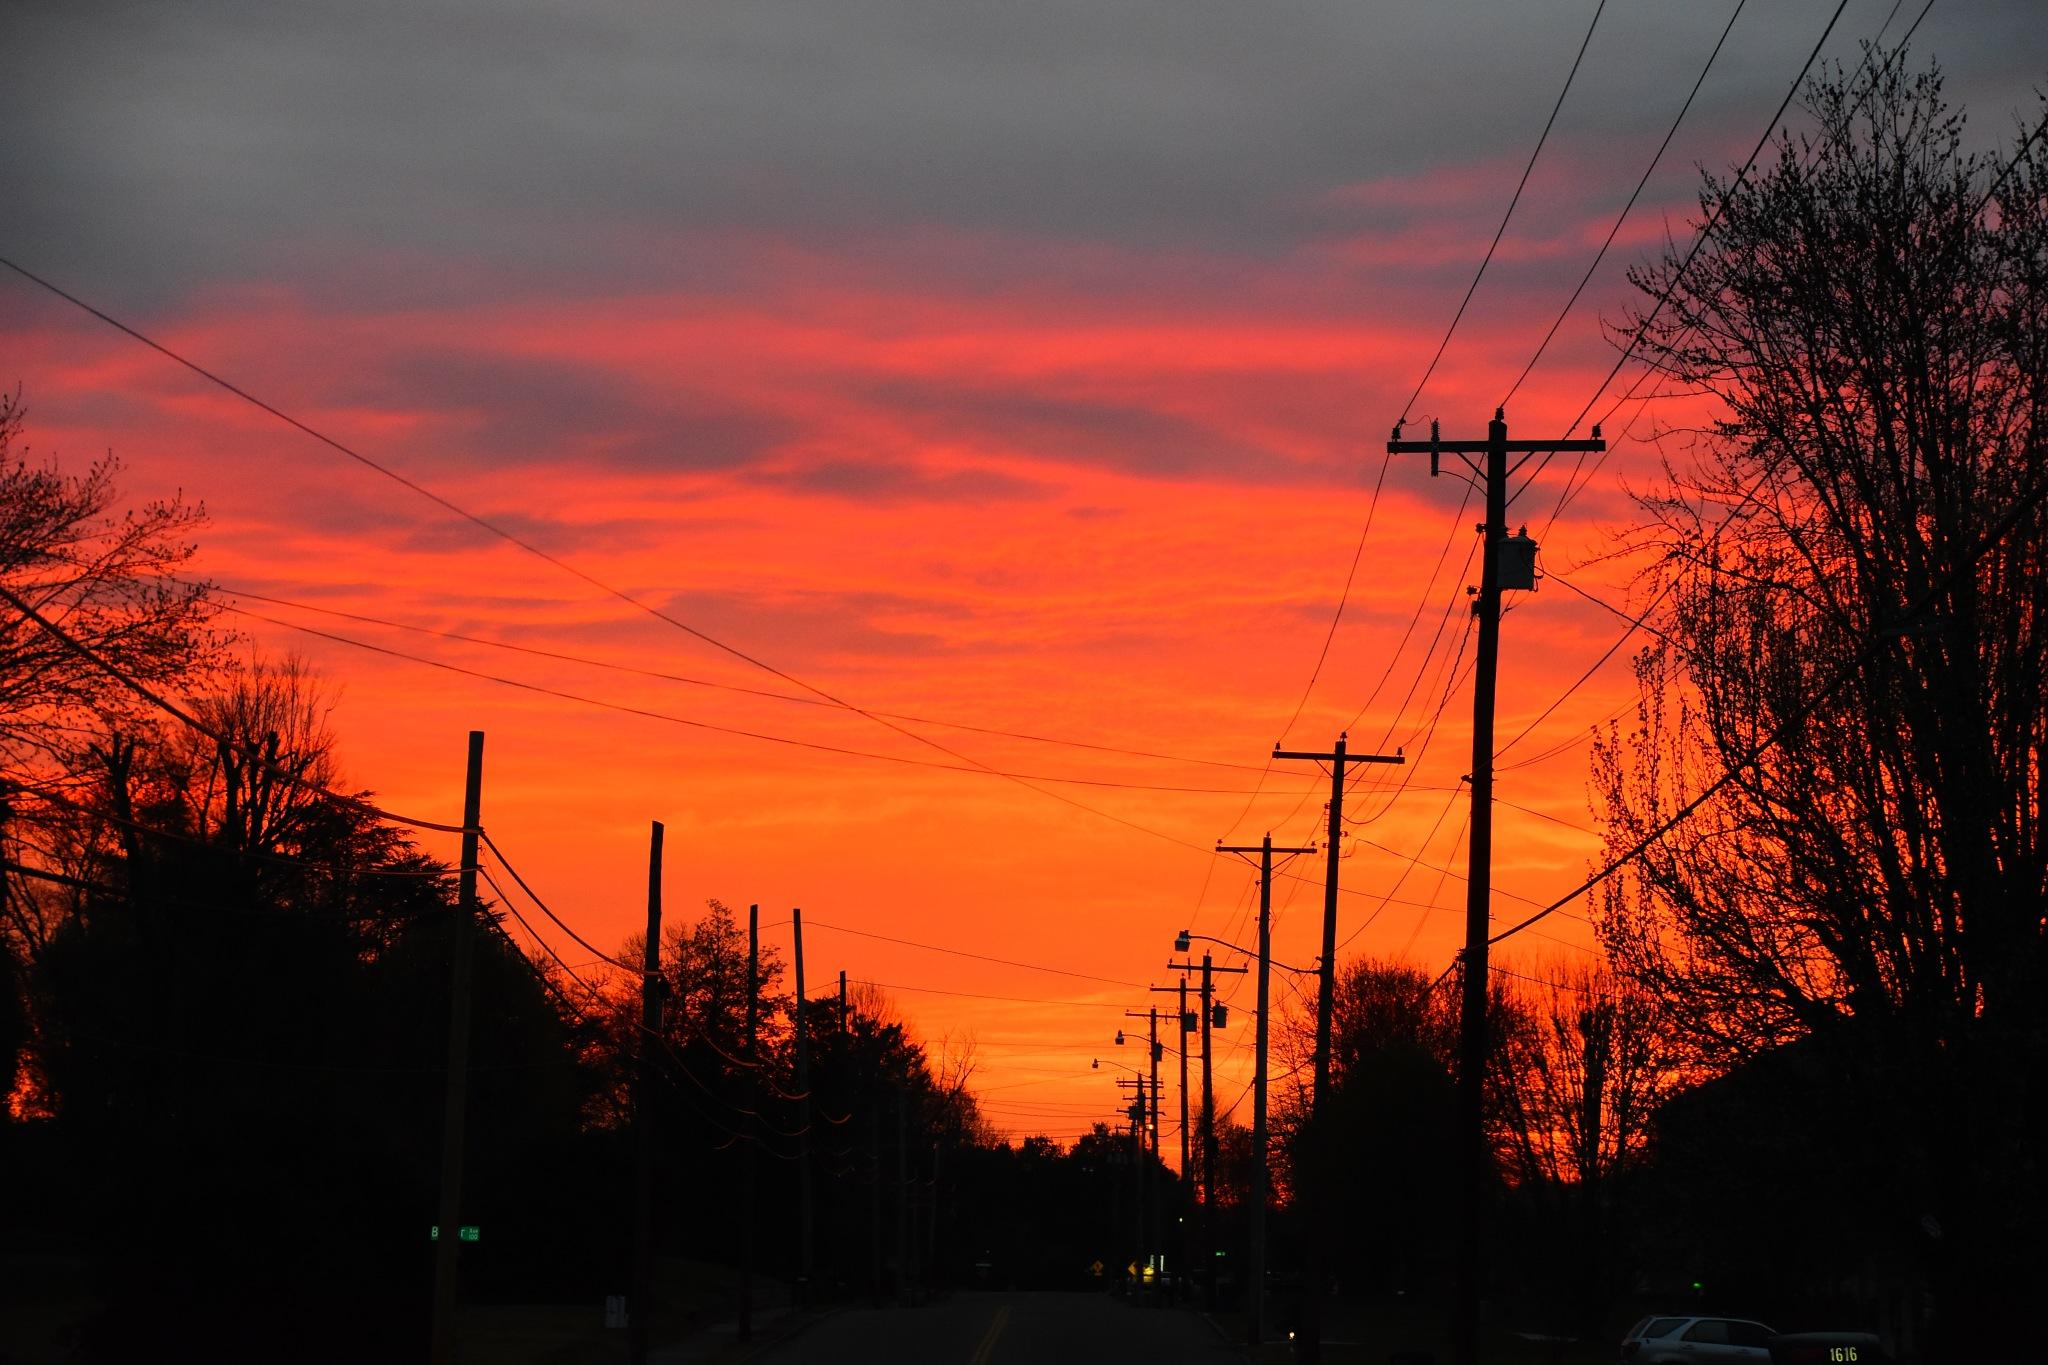 Sunrise 2 March 17 by Greg Knott